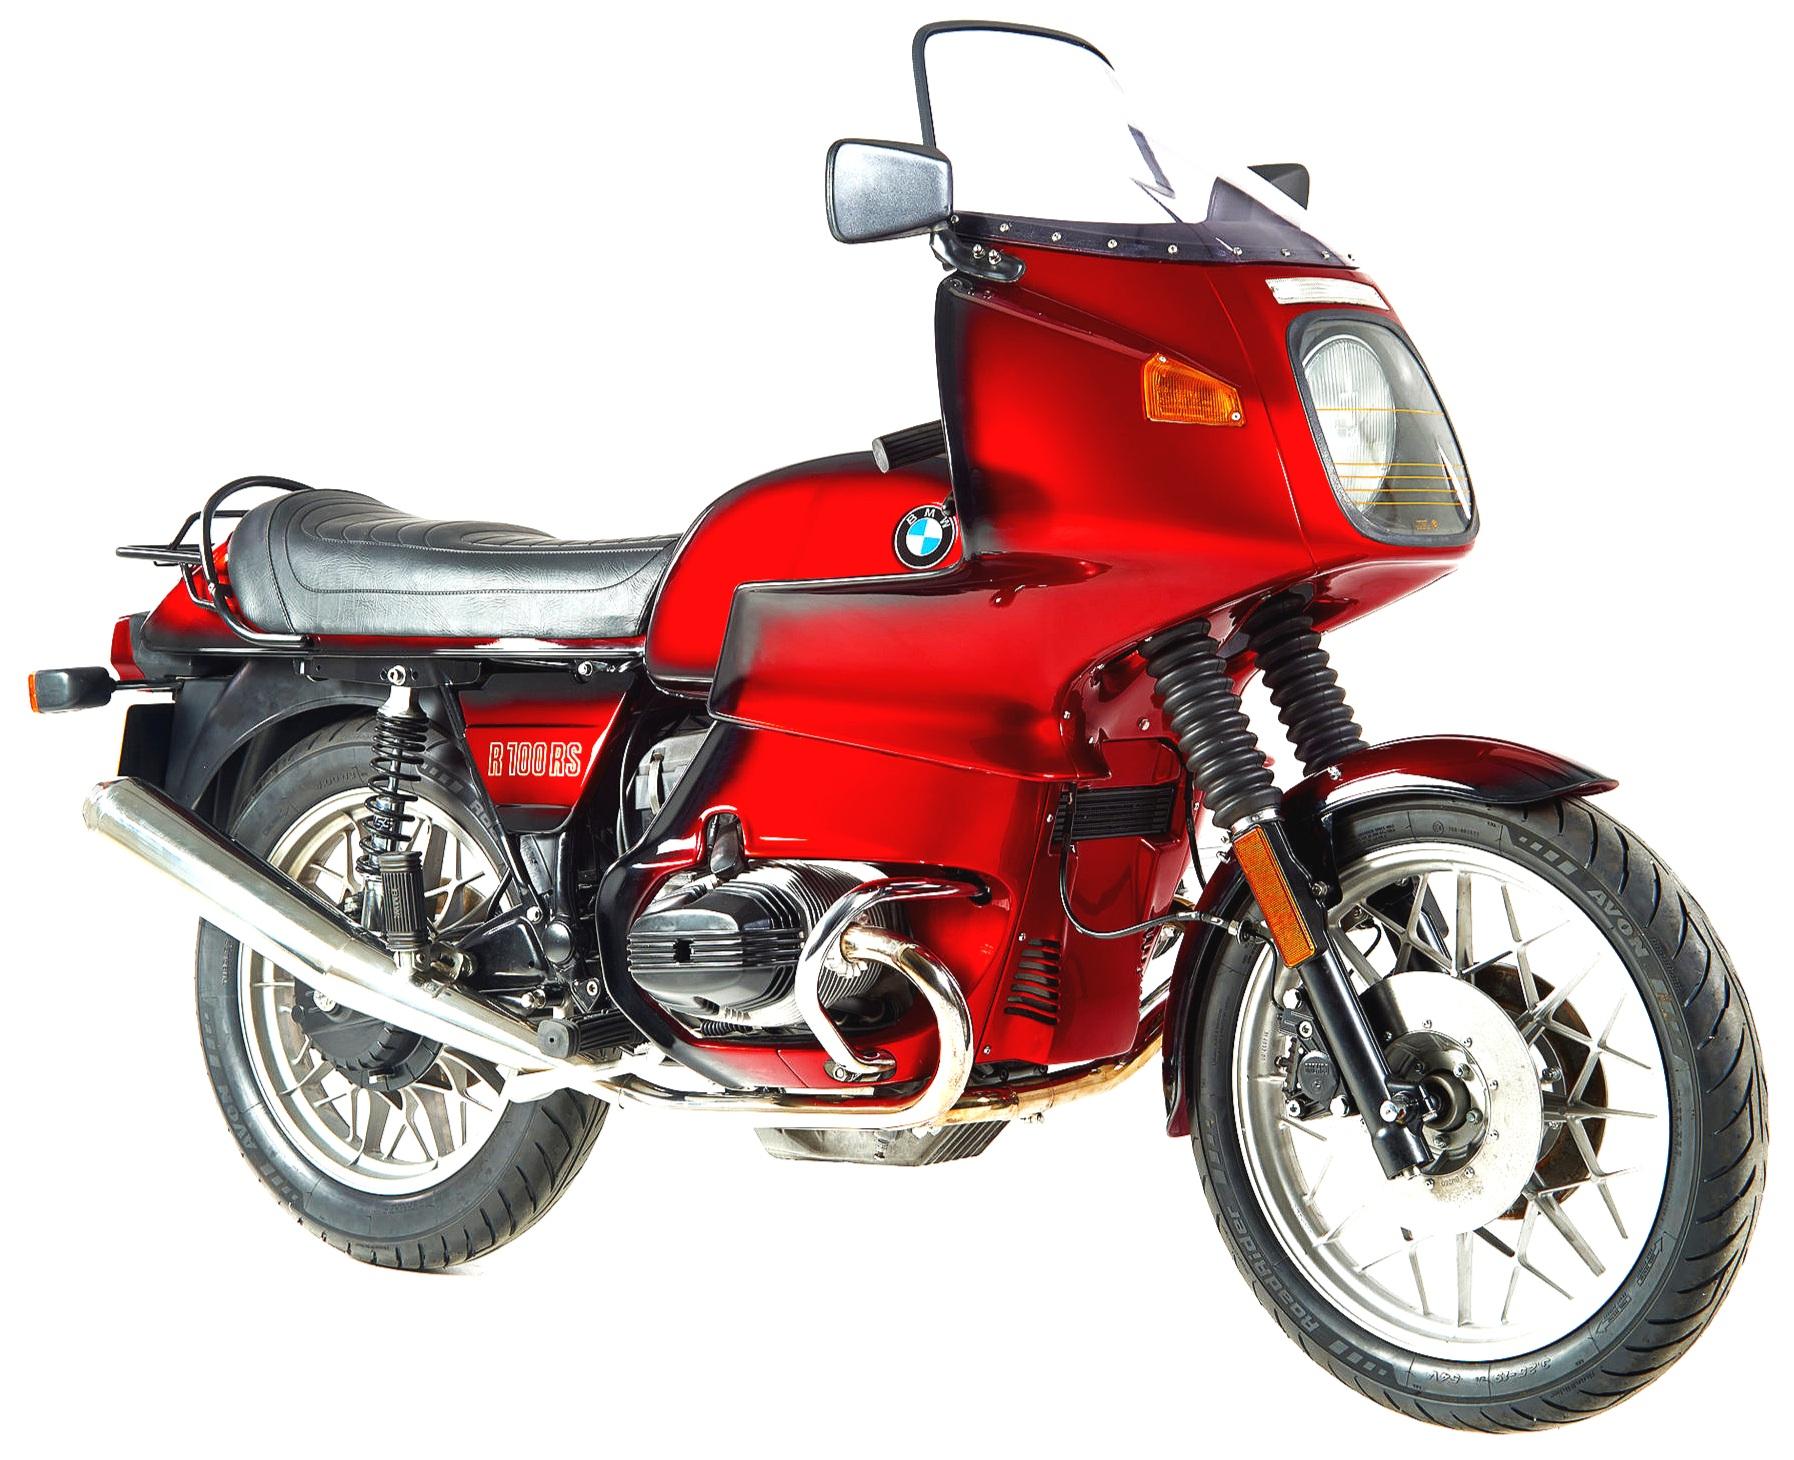 BMW R100RS